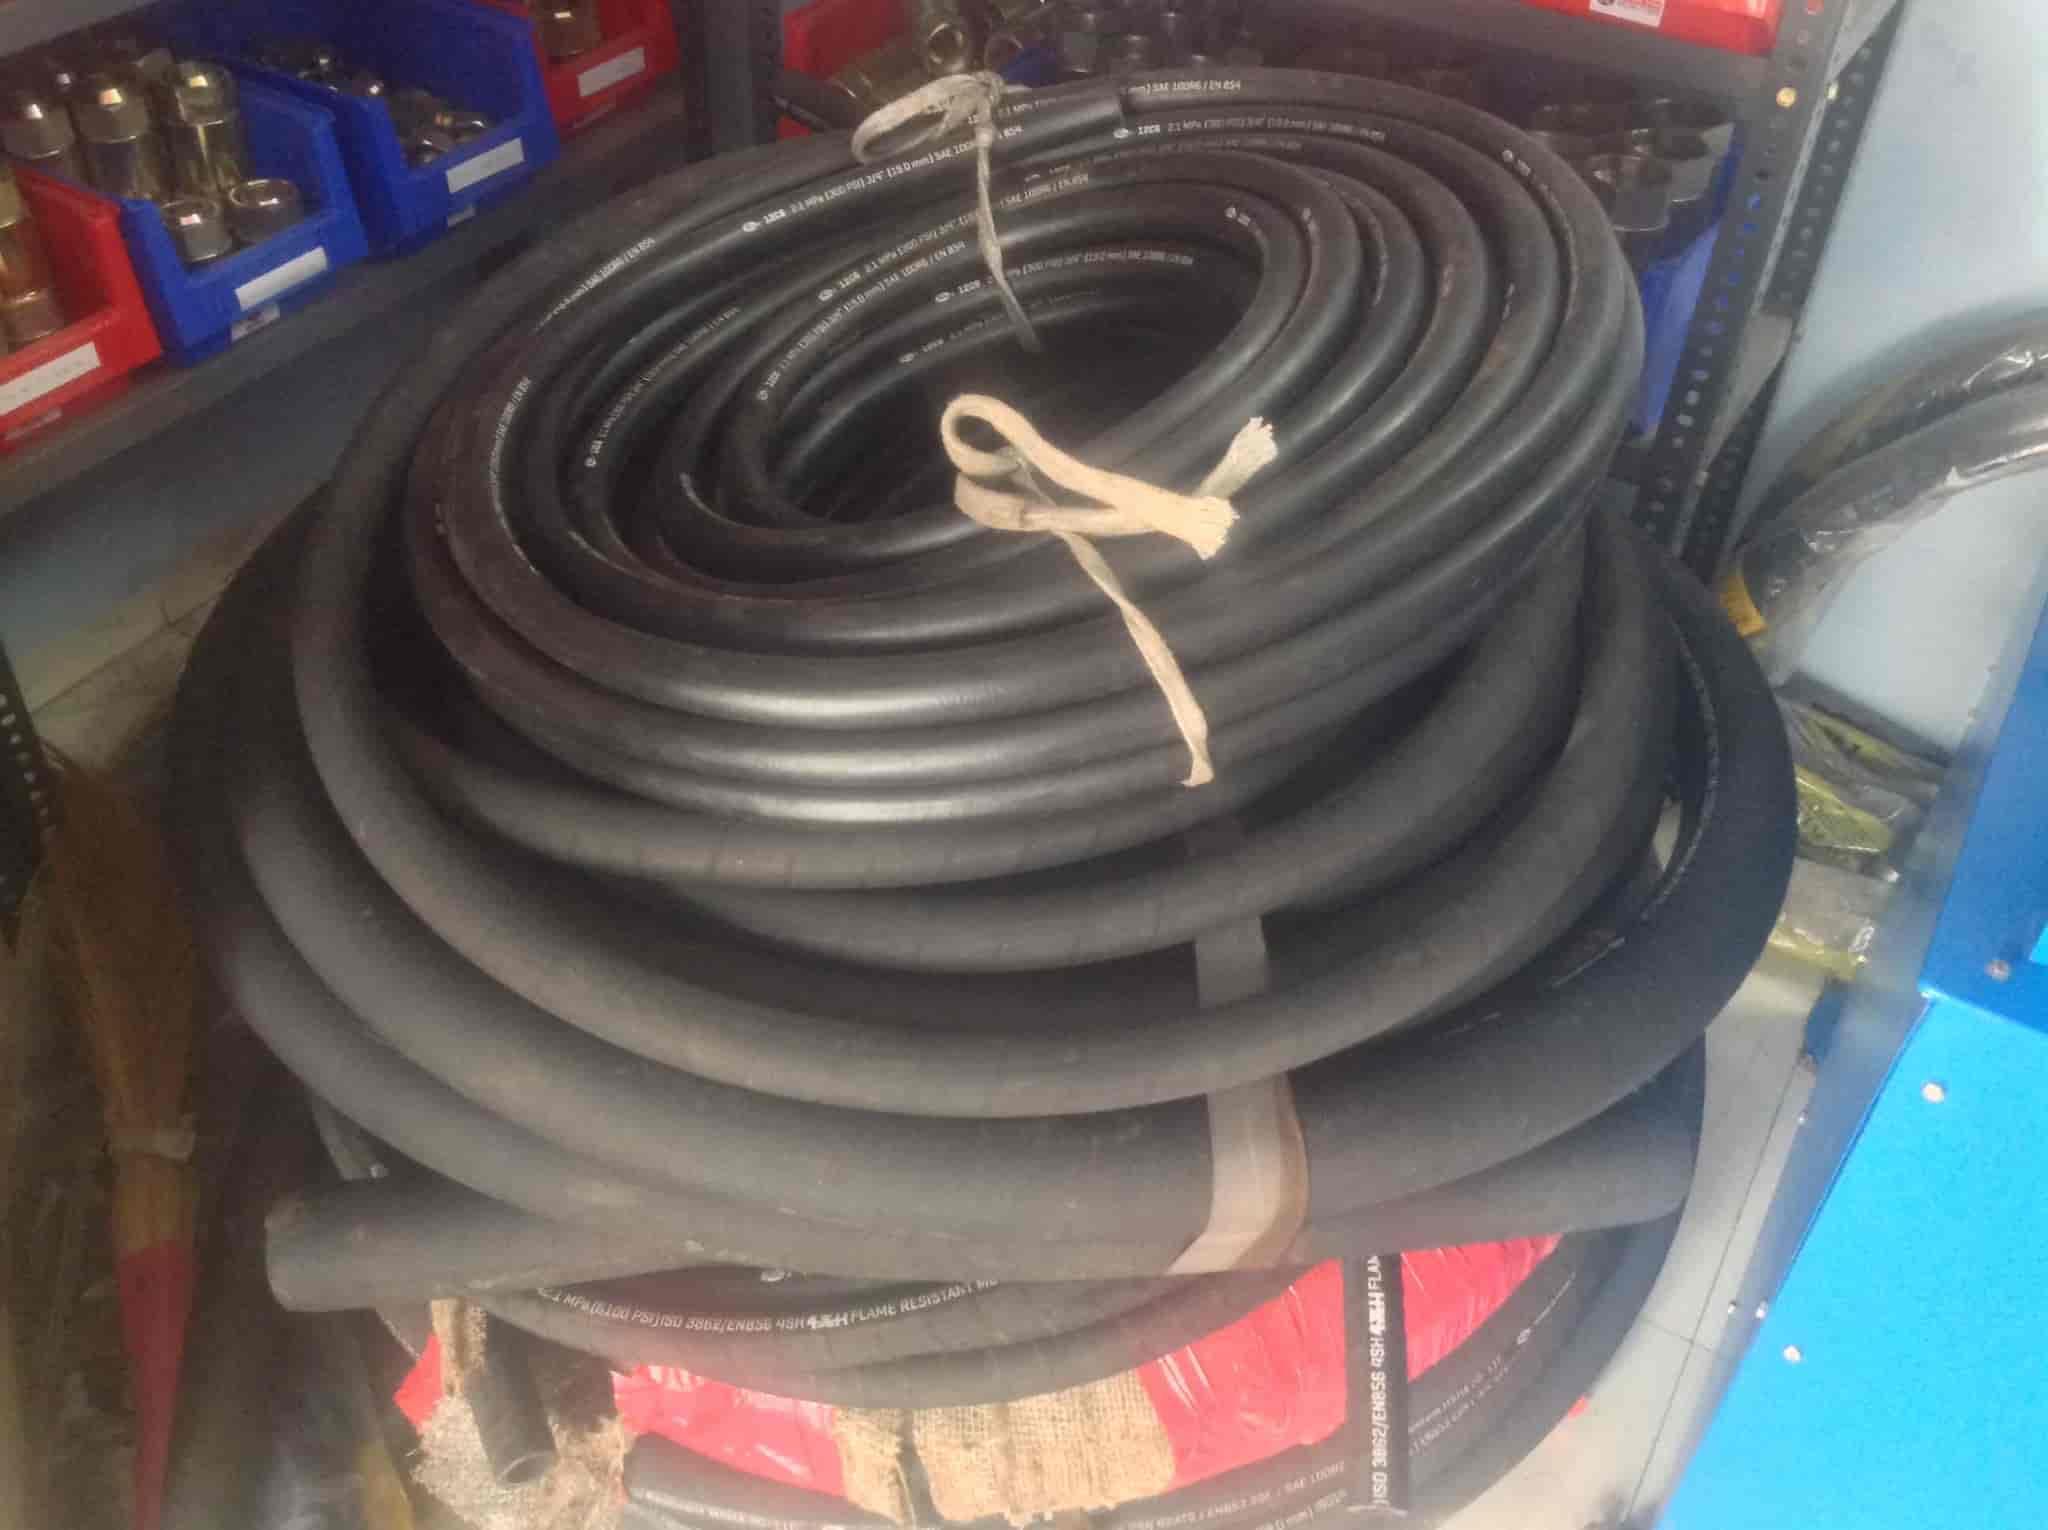 Soham Enterprises, Waluj MIDC - Hydraulic Equipment Dealers in ...